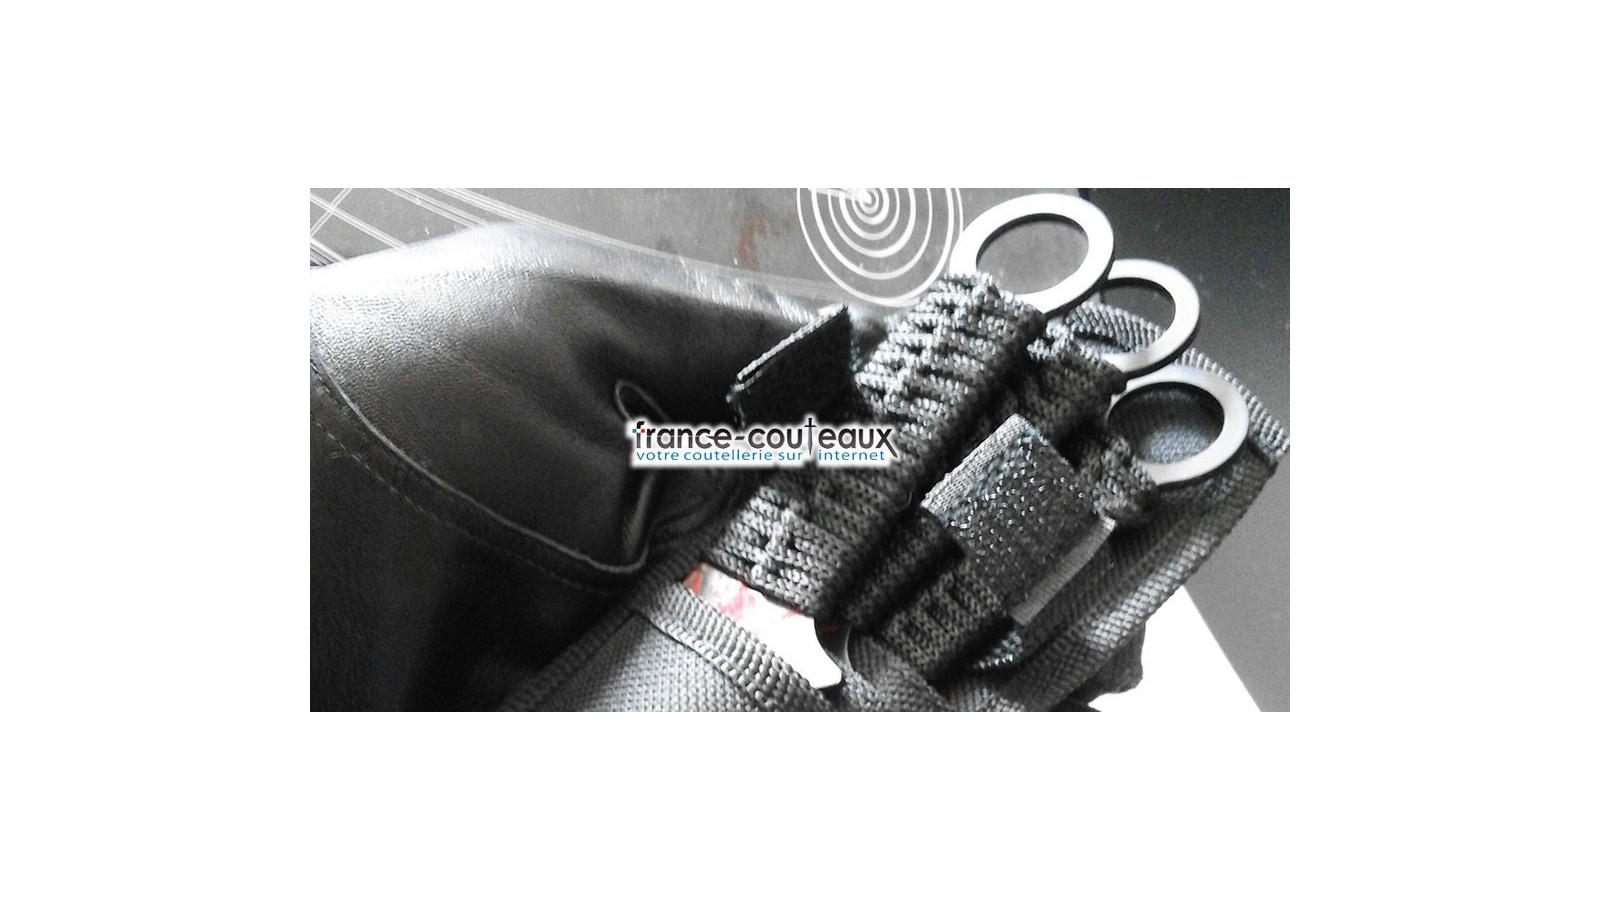 Lampe Shockertac 1108 - 3 800 000 Volts